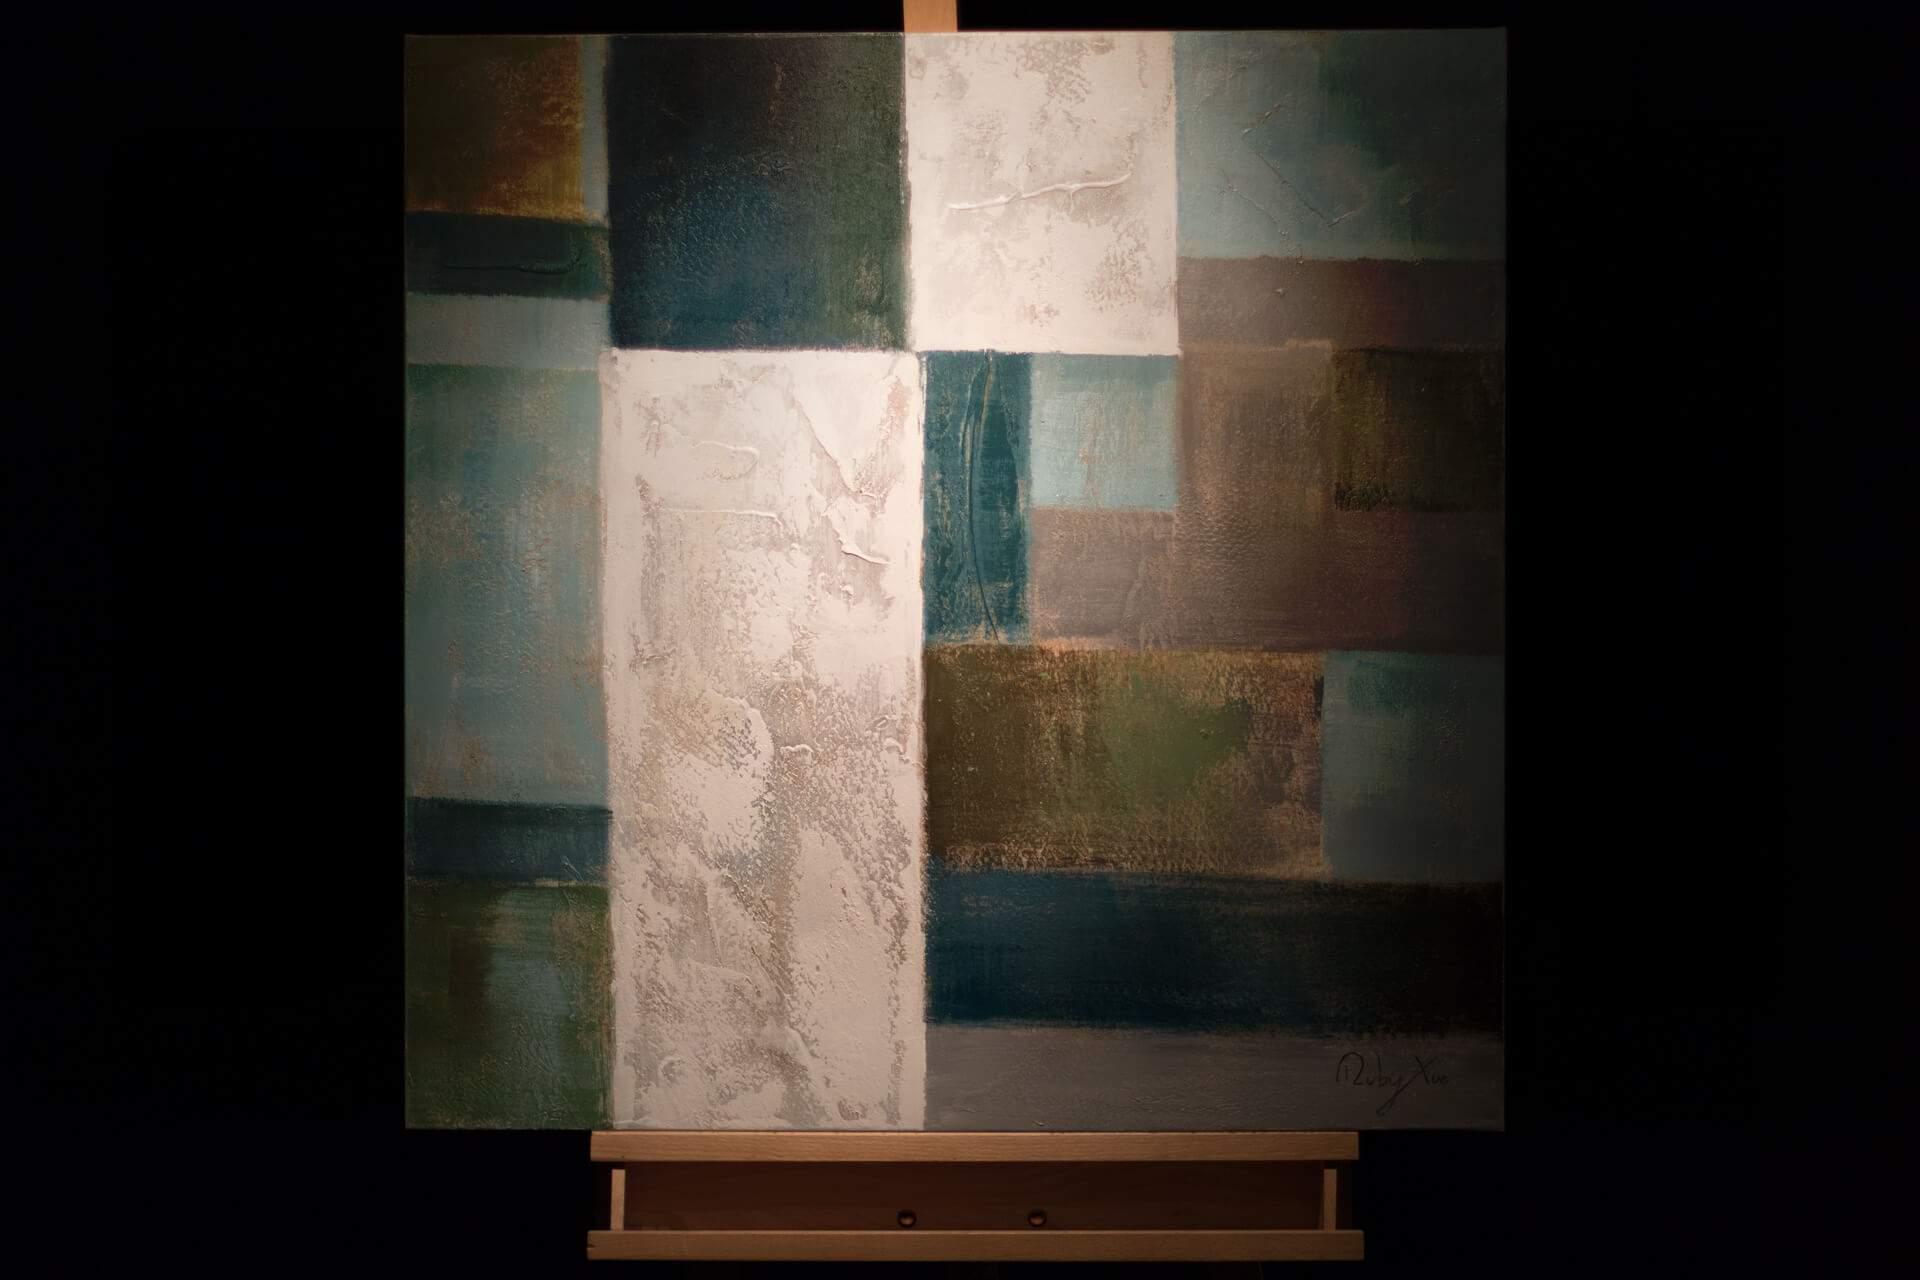 KL modern quadrate modern acryl gemaelde oel bild oelgemaelde 06